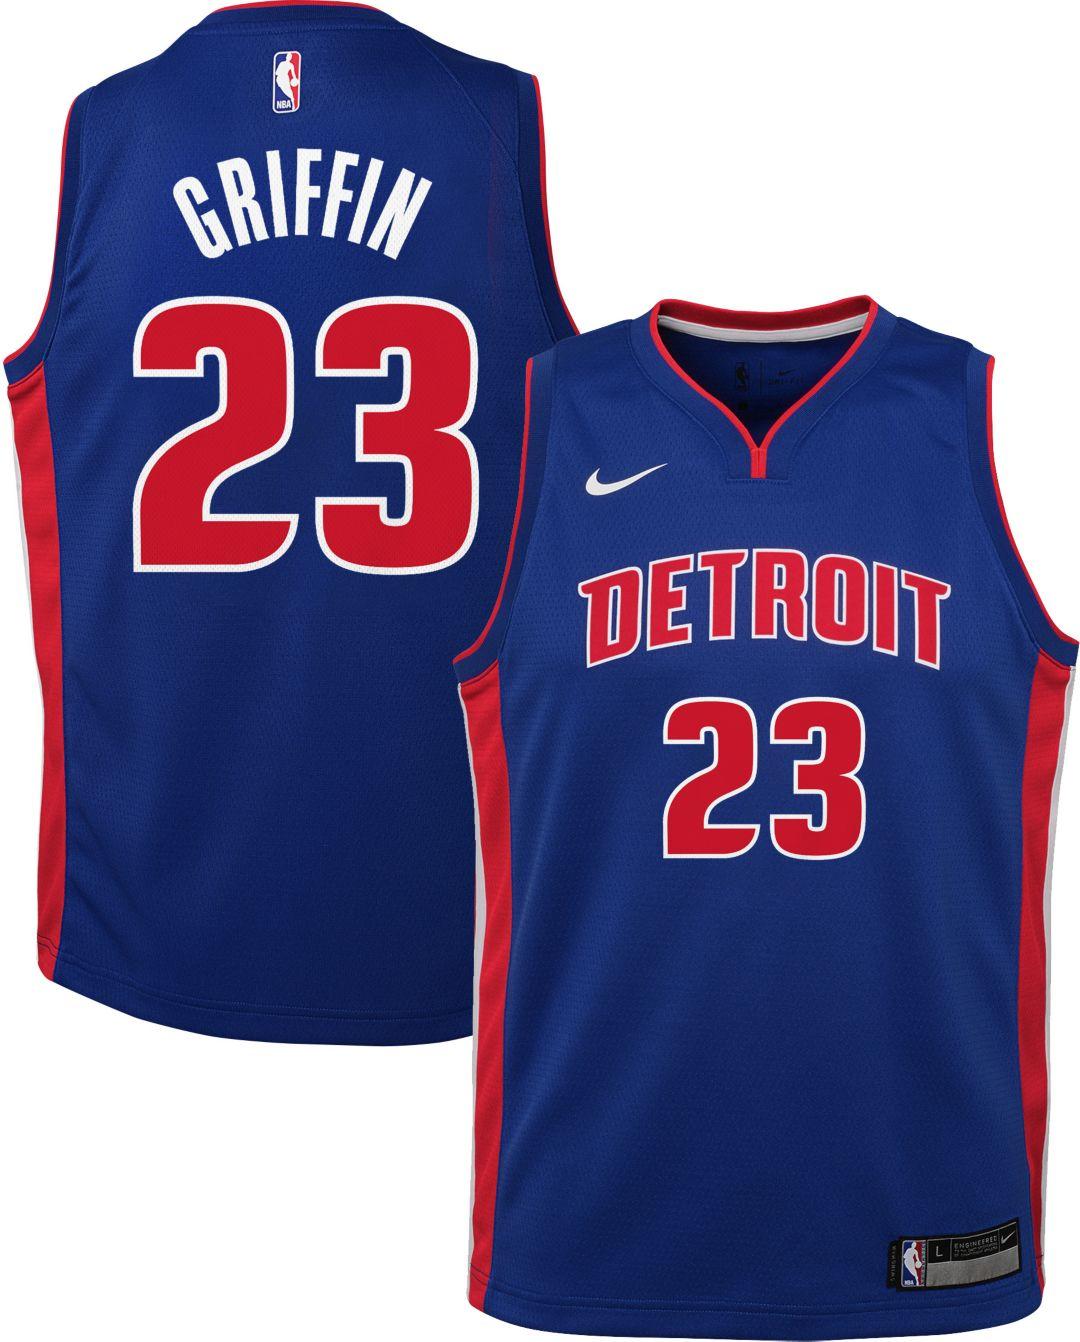 online store 9f23f c8685 Nike Youth Detroit Pistons Blake Griffin #23 Royal Dri-FIT Swingman Jersey